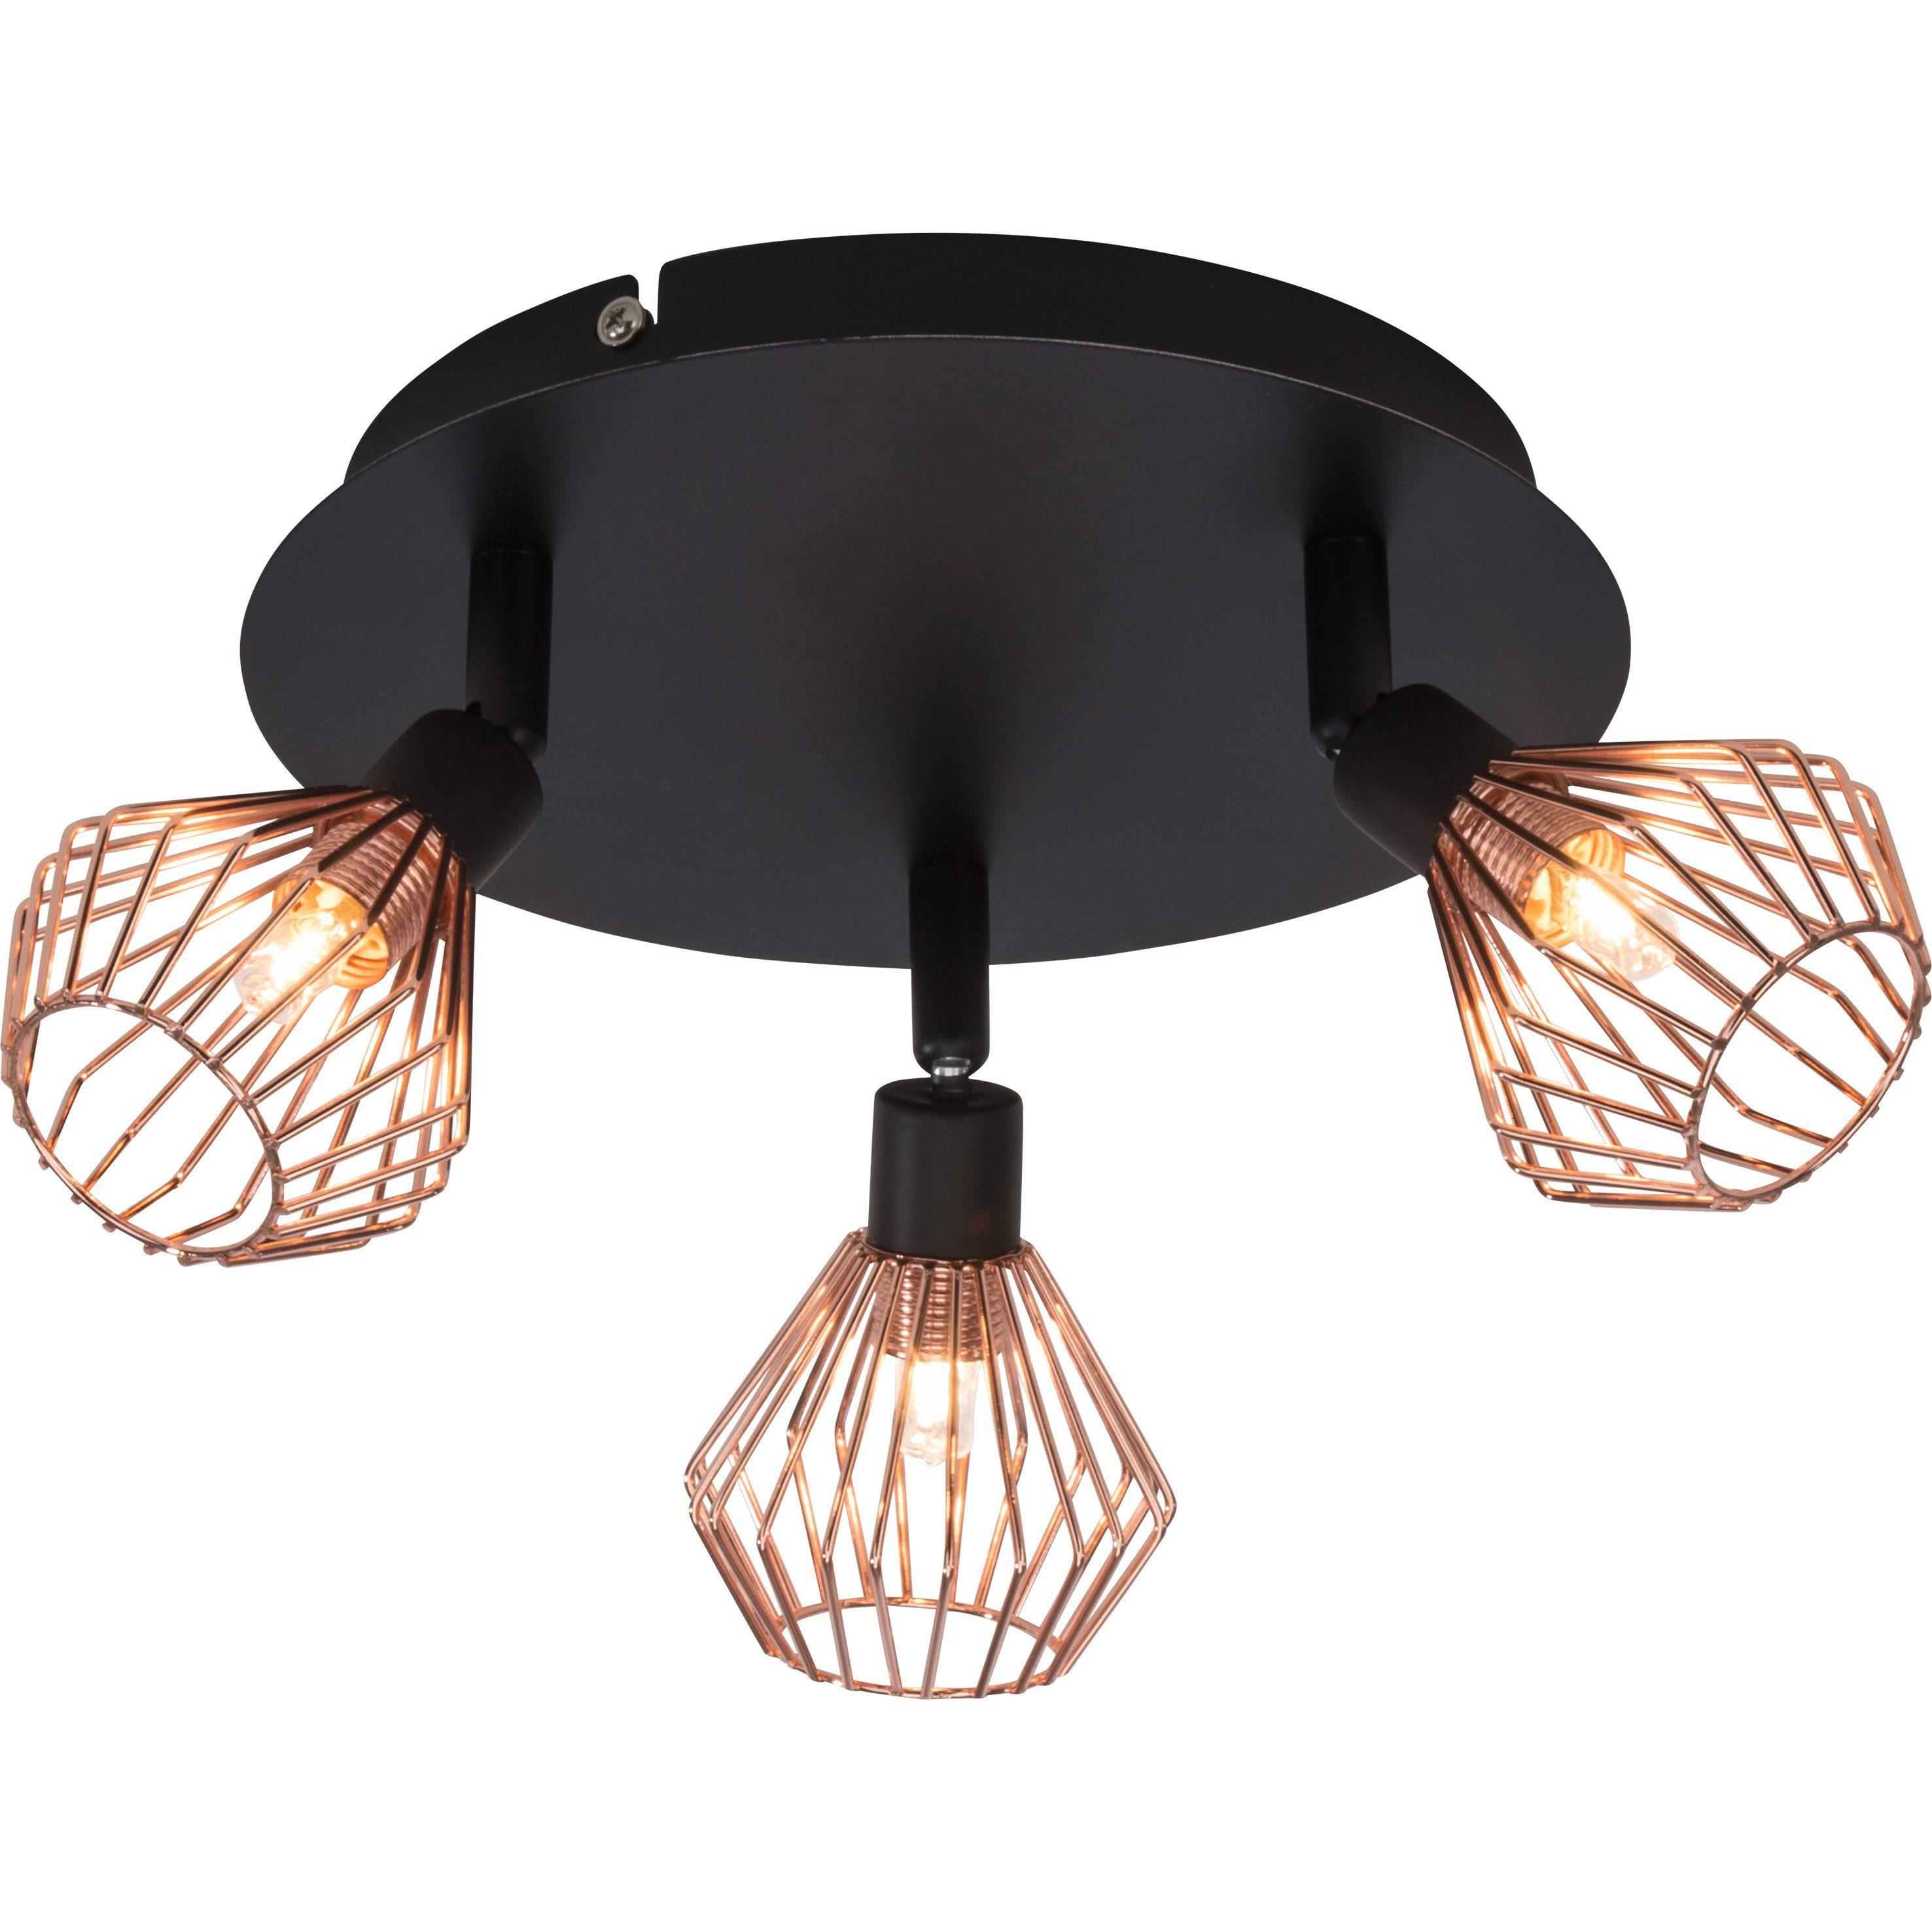 Brilliant Leuchten Dalma Spotrondell, 3-flammig schwarz/kupfer